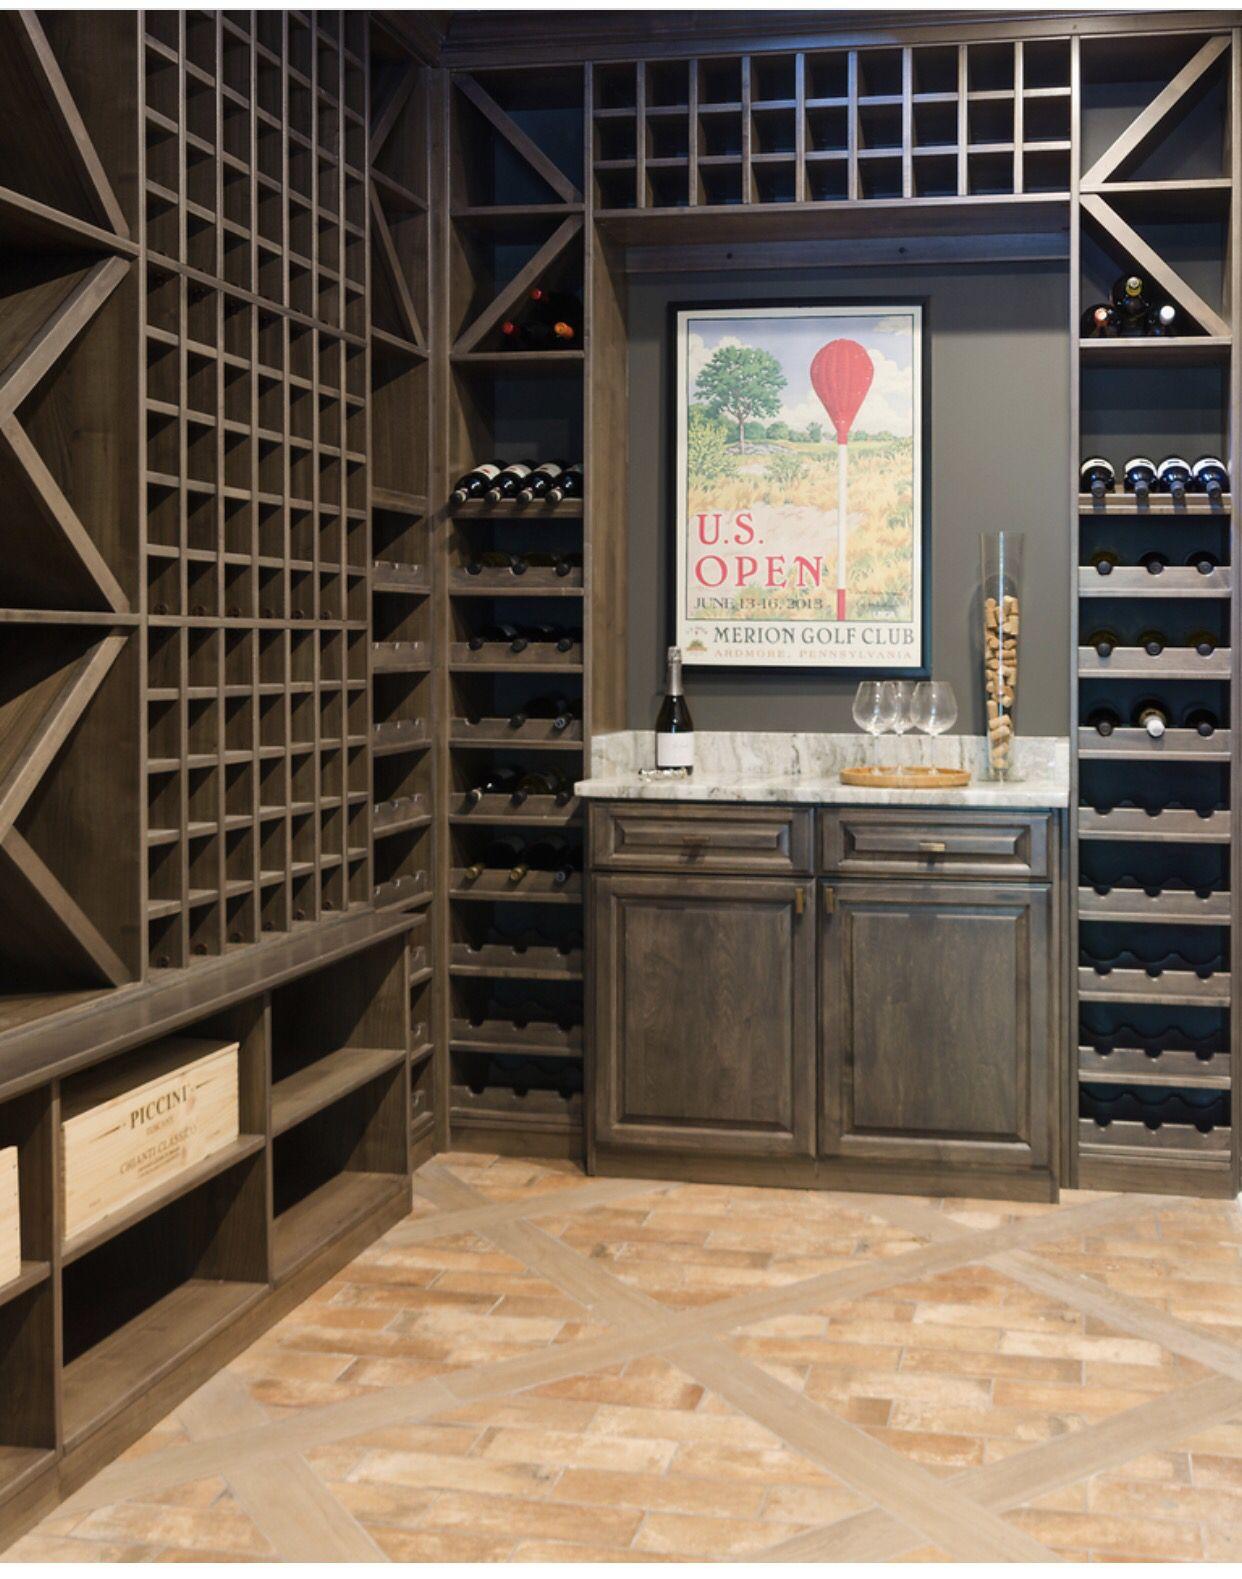 Gentil Wine Room Goals Via The Closet Factory (678) 315 0862 | IG:  Derek_closetfactory_mia Derek.enriquez@closetfactory.com